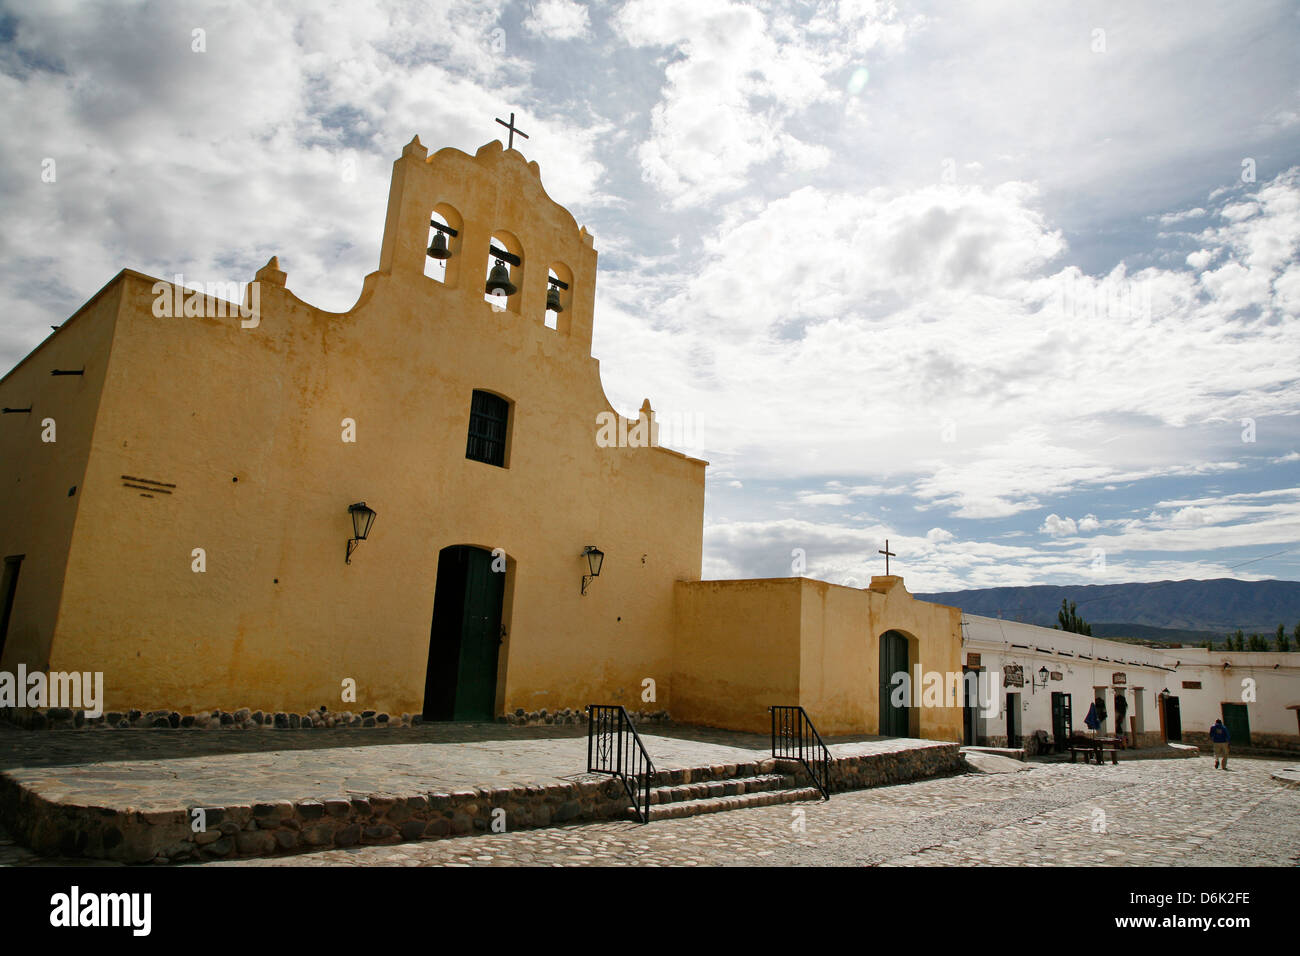 San Jose de Cachi church located at the main square in Cachi, Salta Province, Argentina, South America - Stock Image